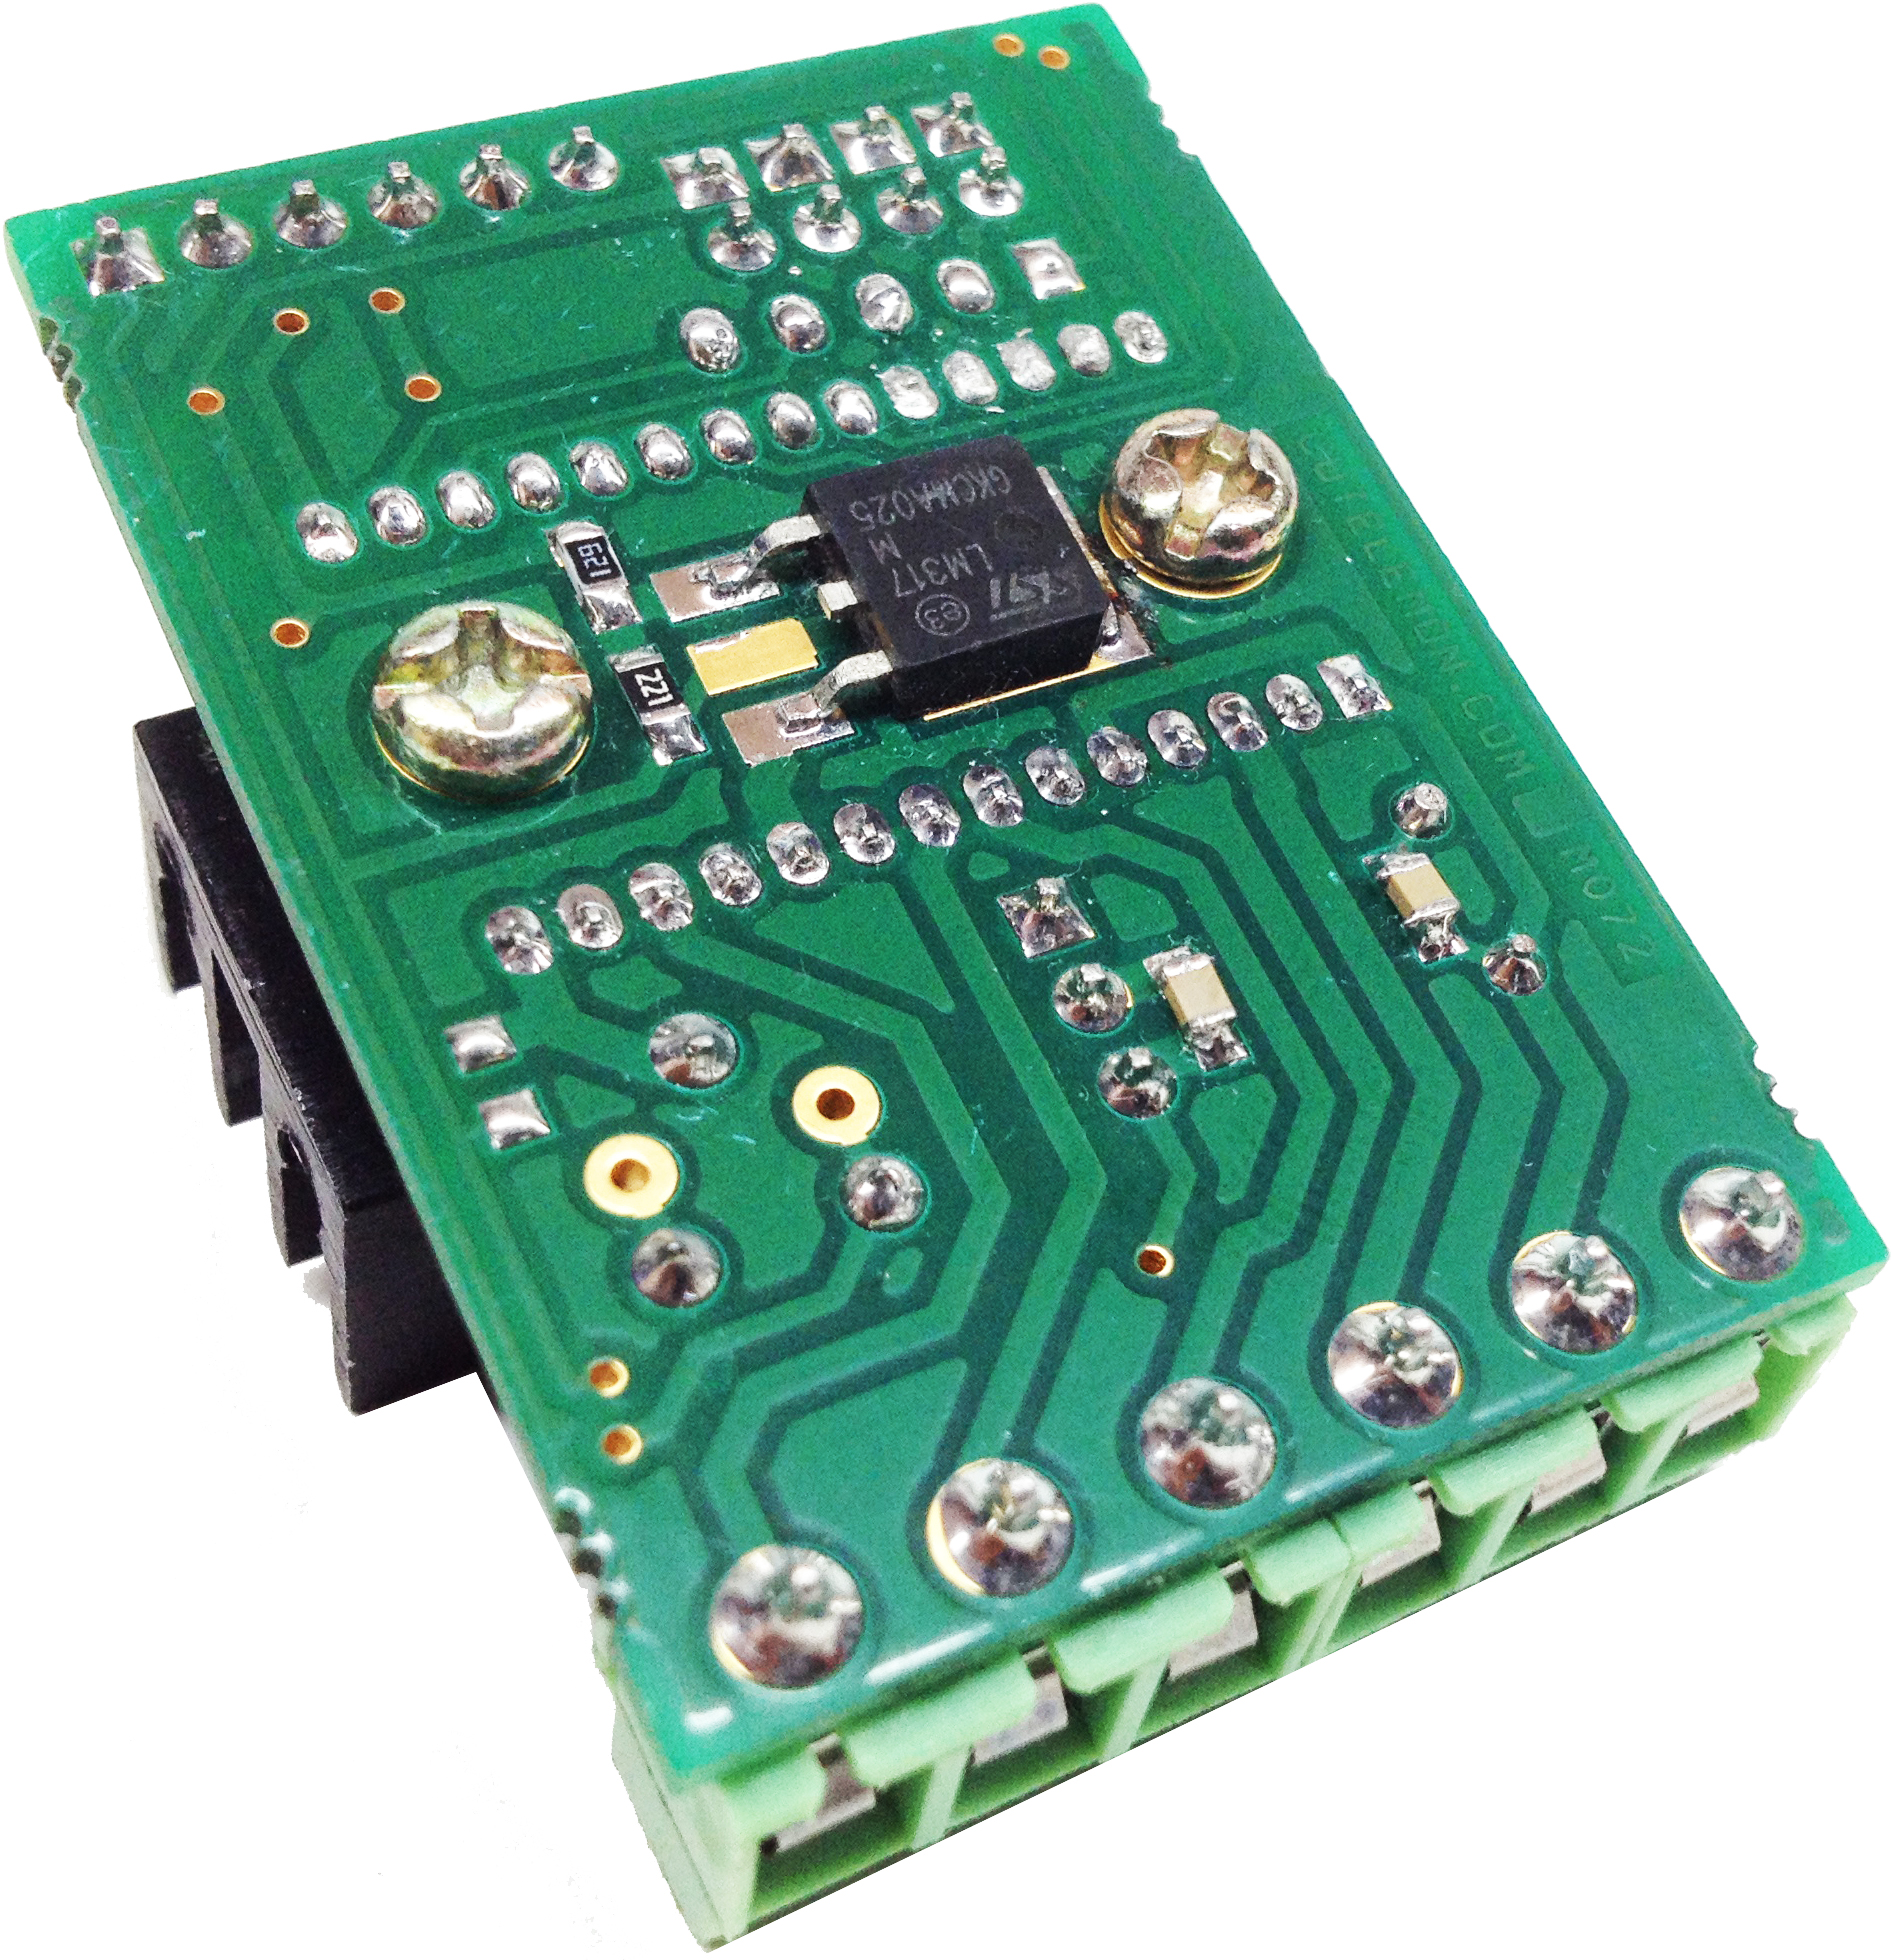 25a Bipolar Stepper Motor Driver Lv8772e Electronics Lab Unipolar Control Circuit With Pic16f877 Pic3